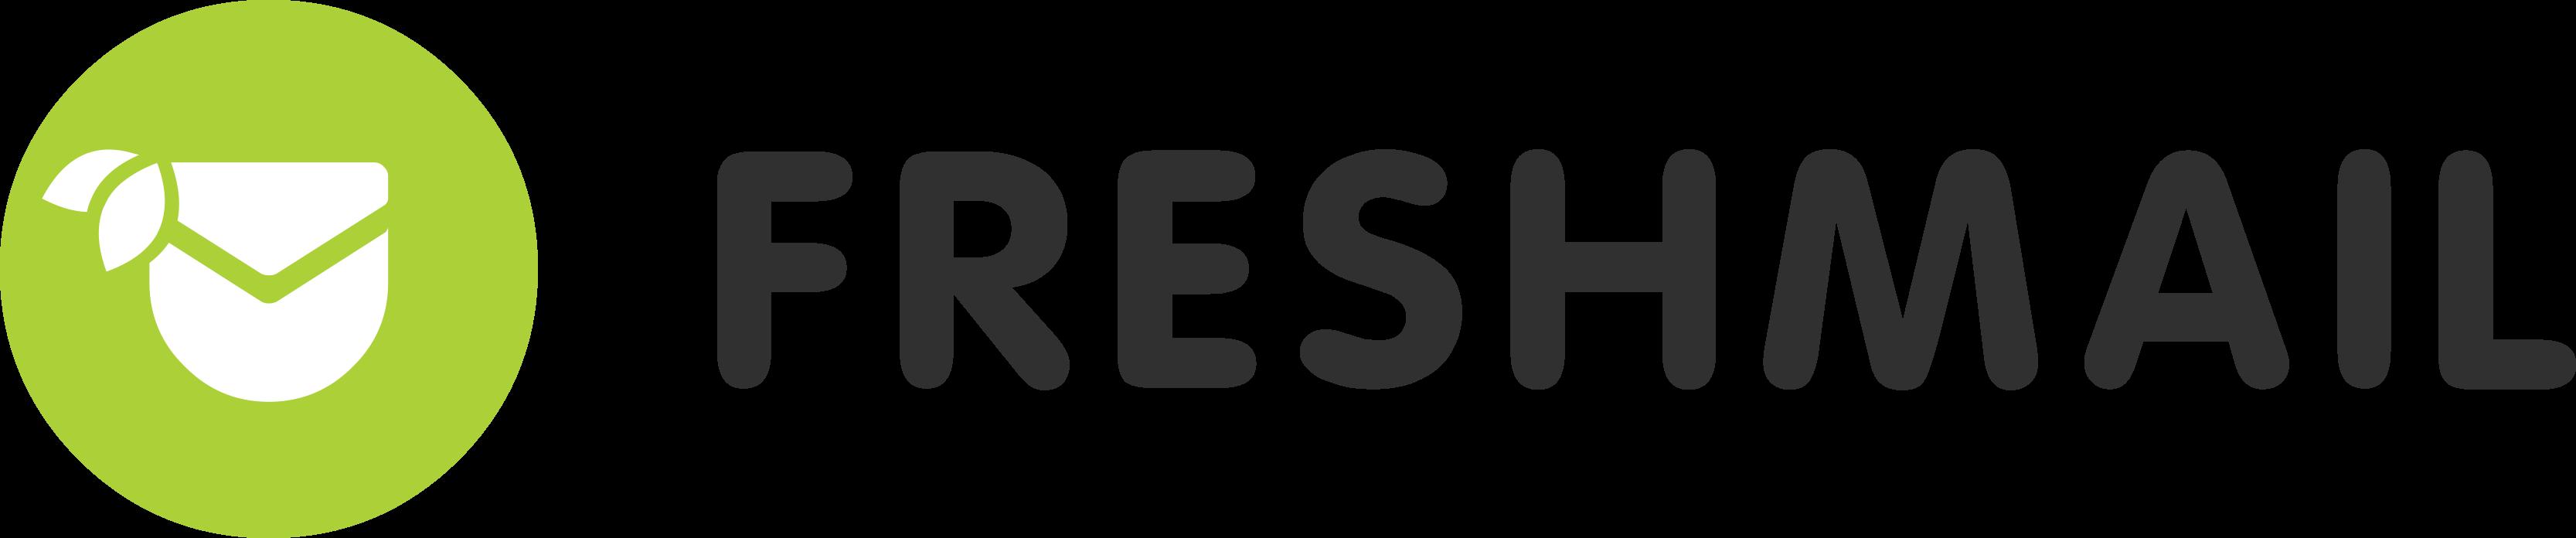 freshmail_logotyp CMYK